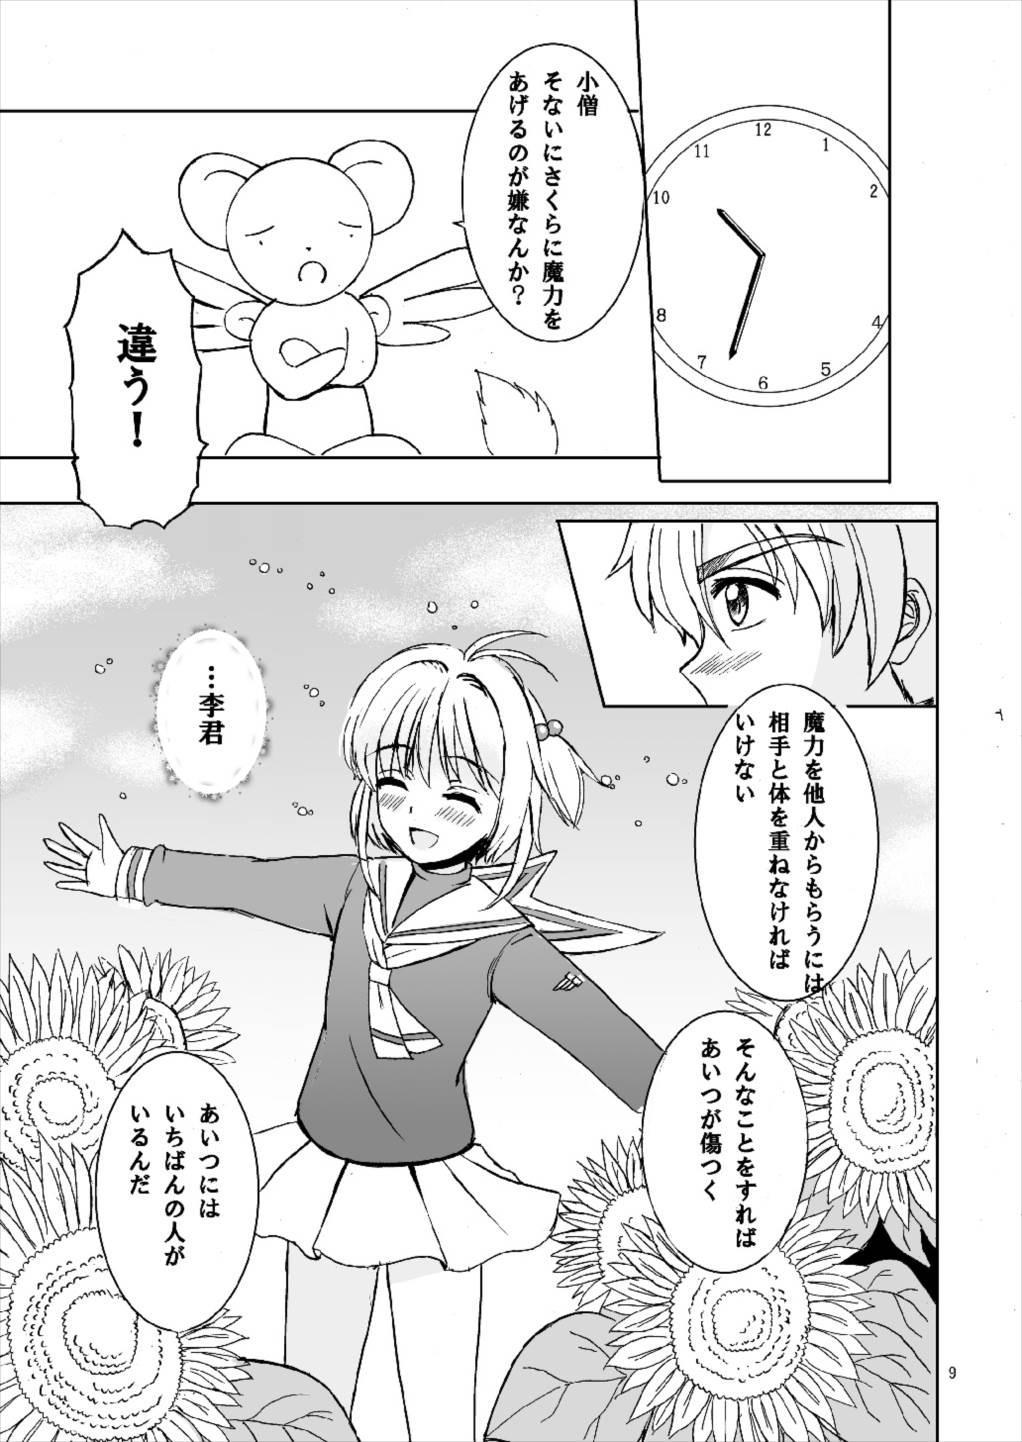 Sakura to Issho! 8